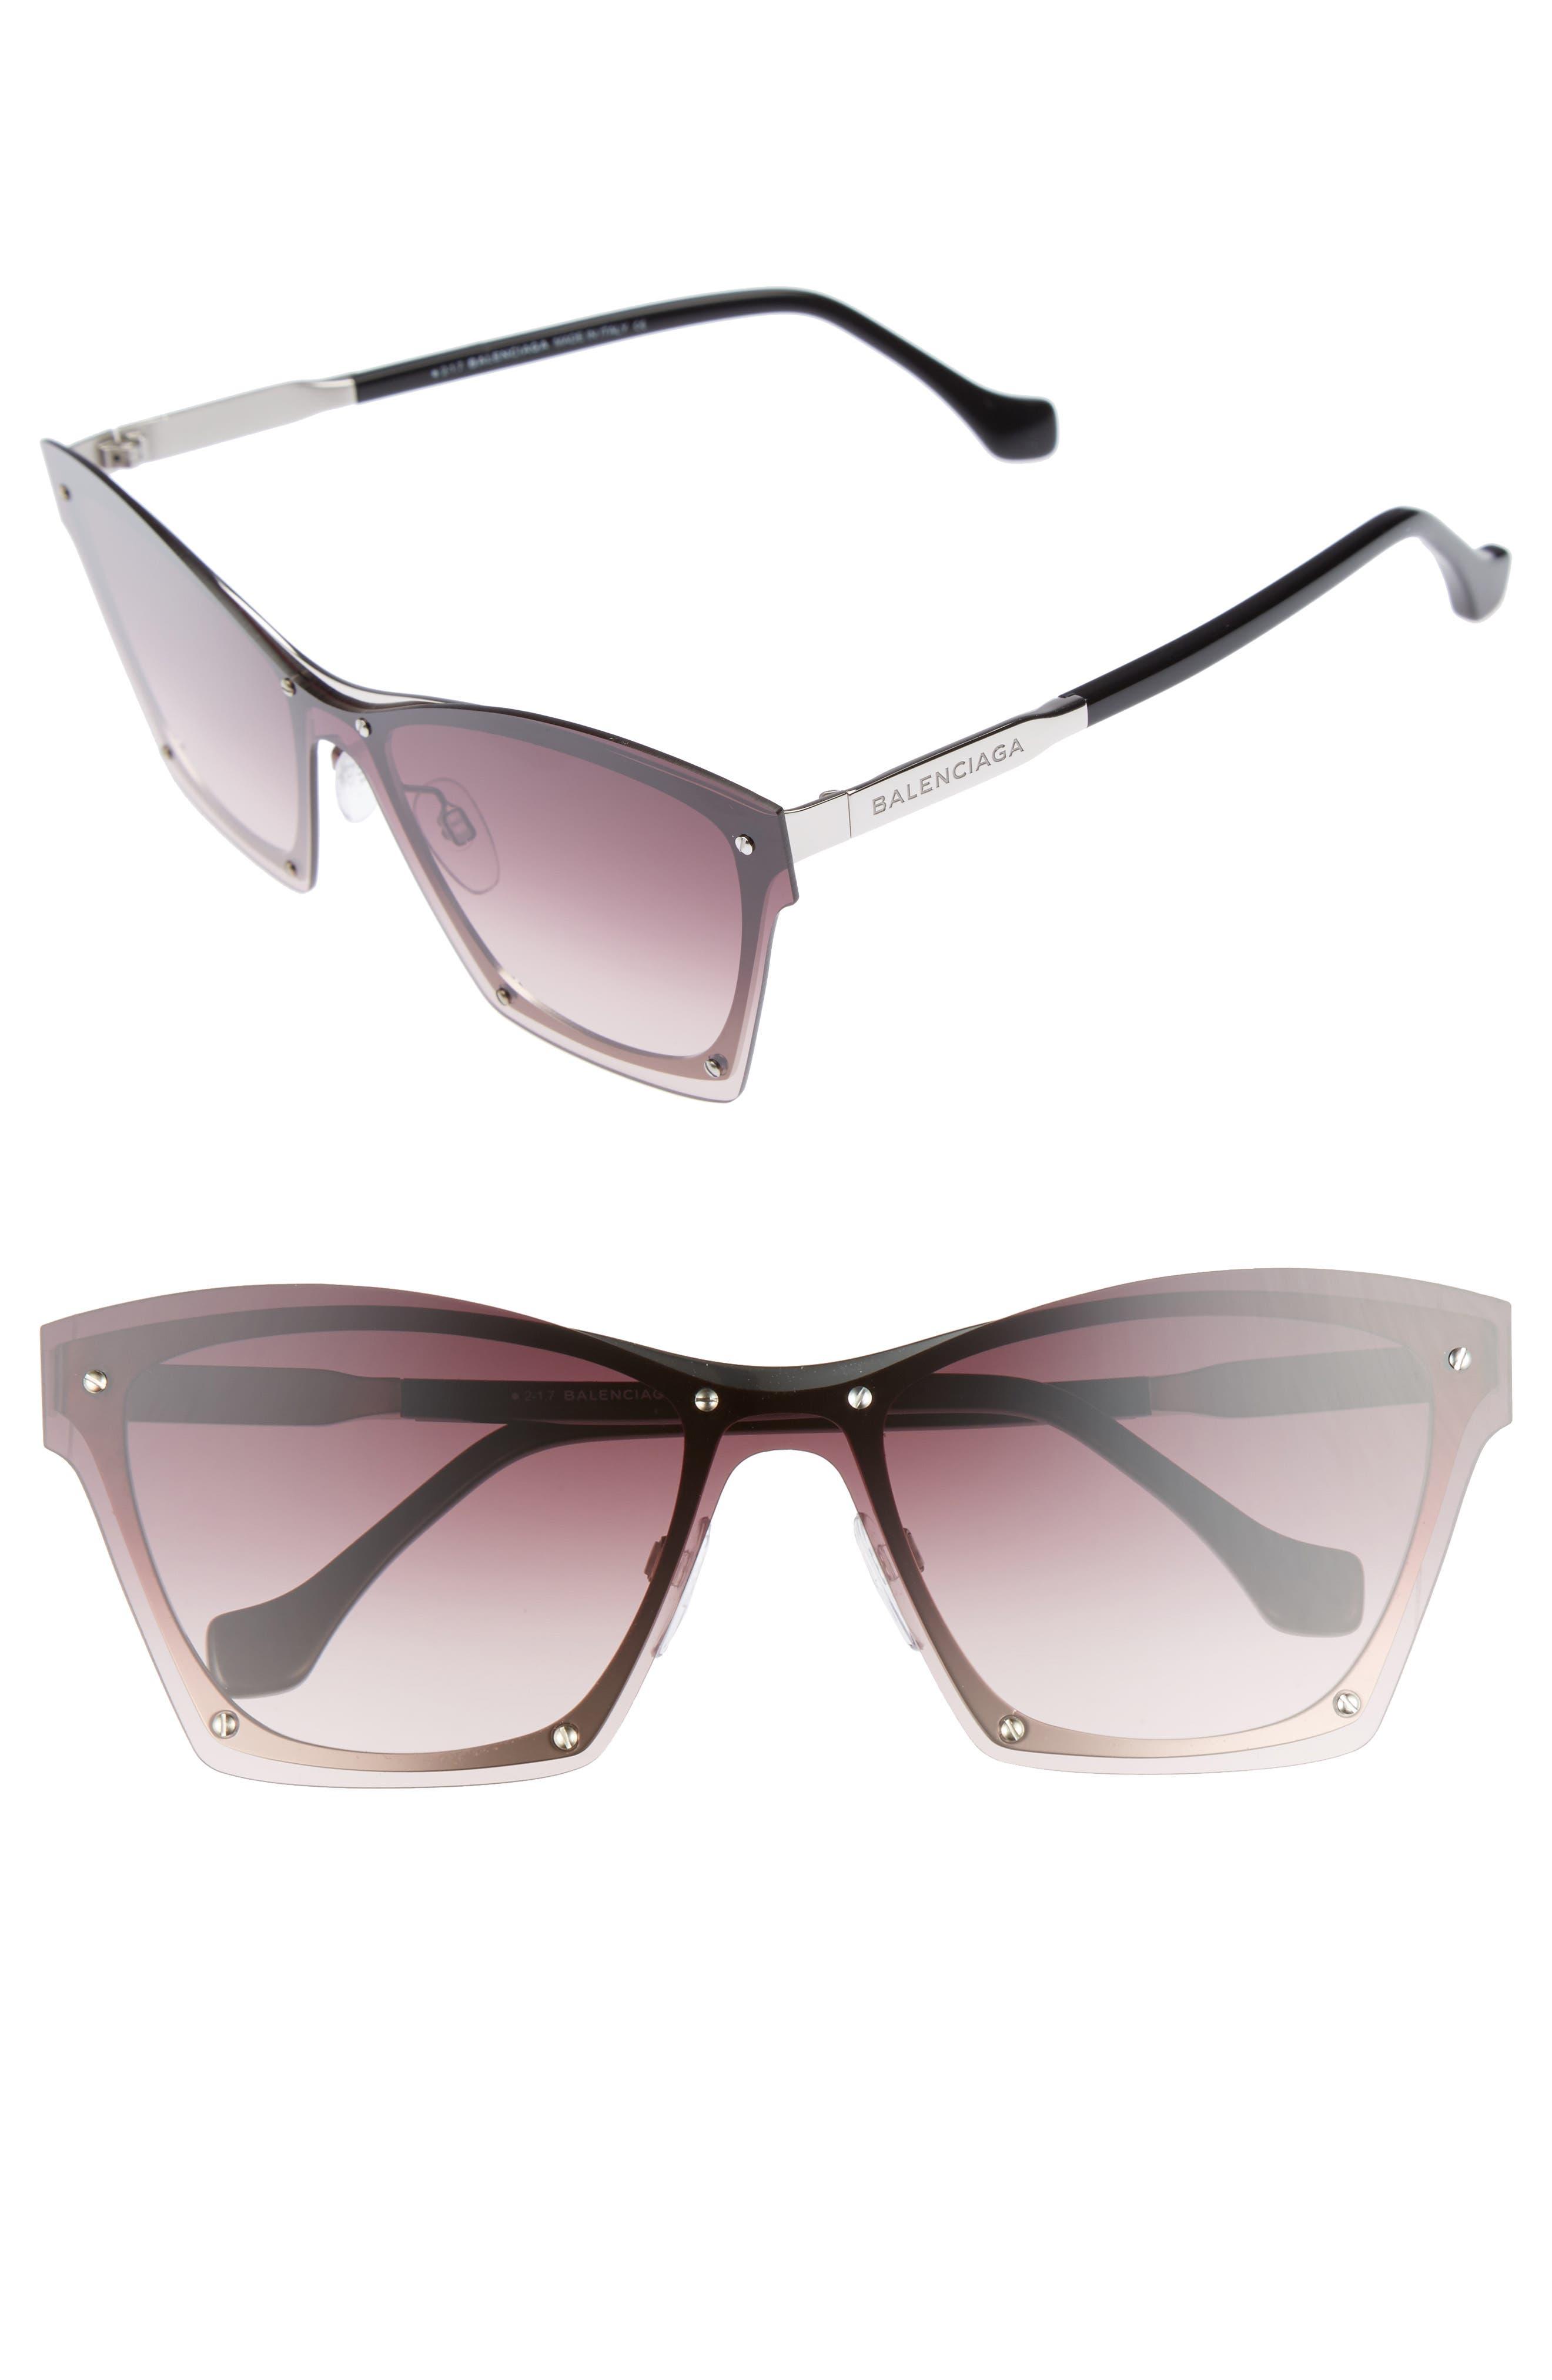 55mm Frameless Sunglasses,                             Main thumbnail 2, color,